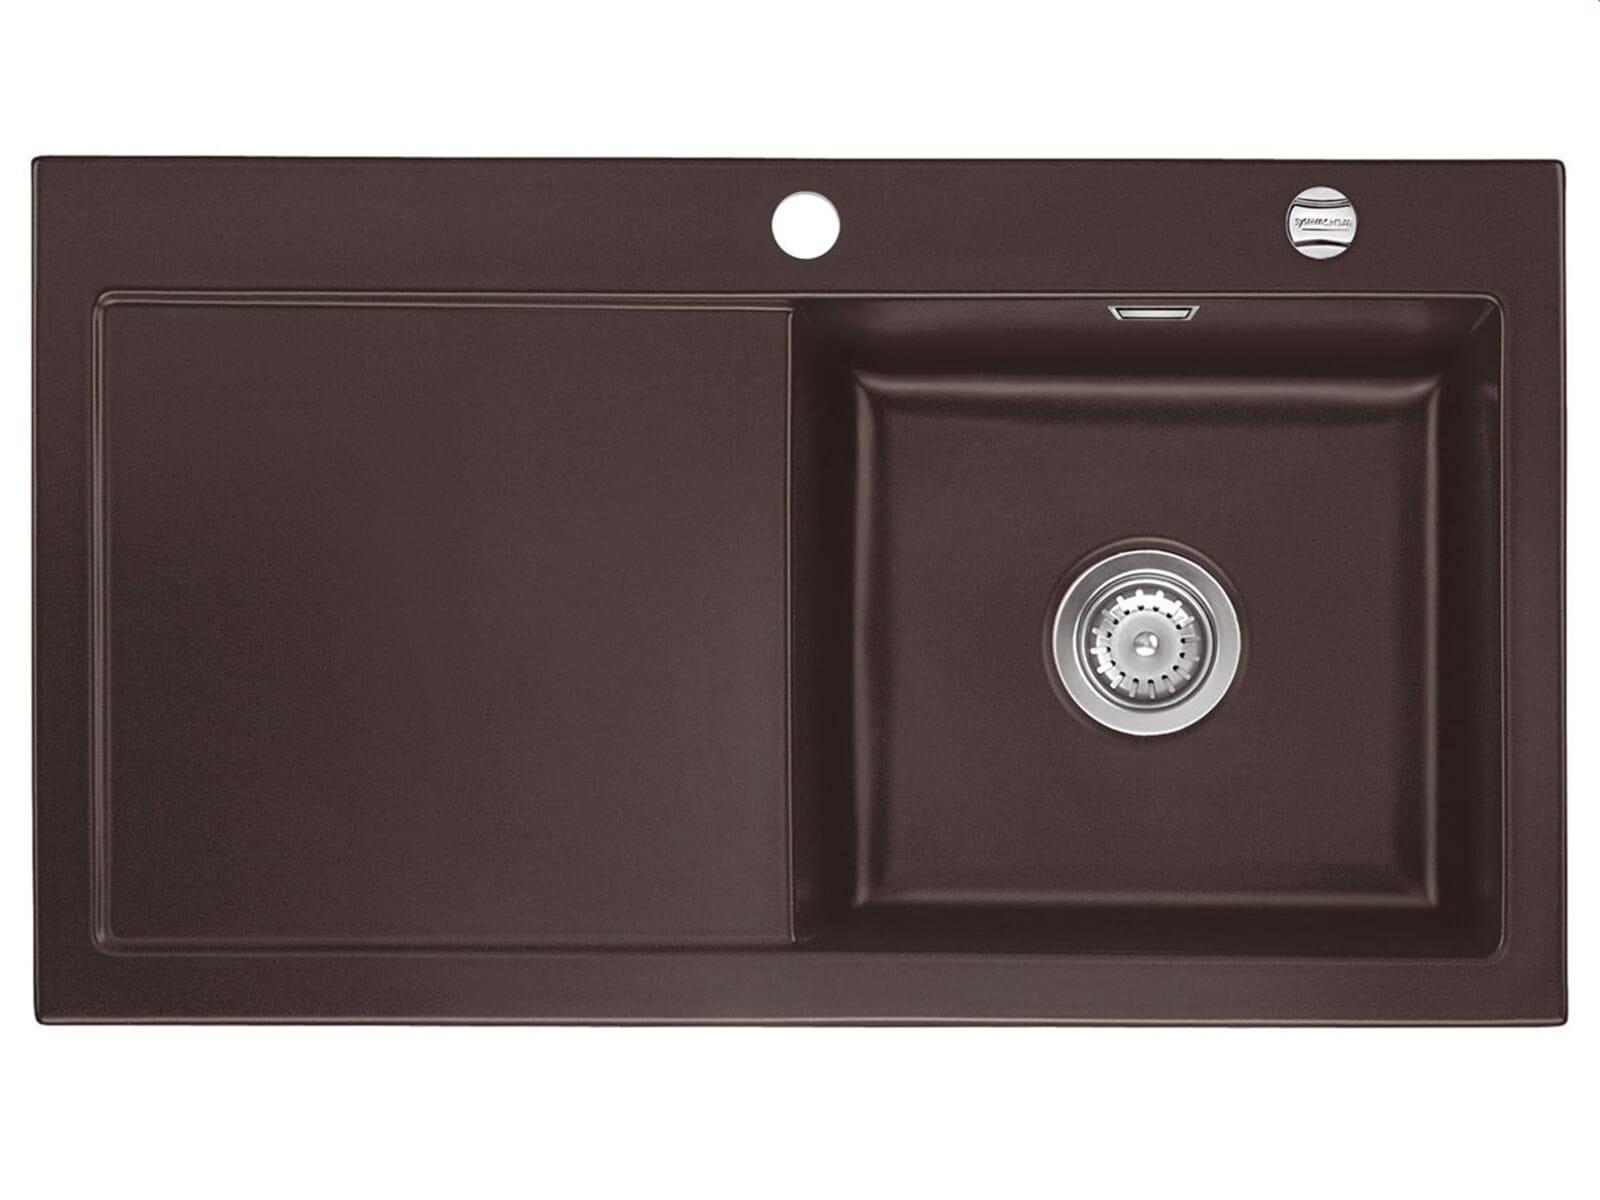 systemceram mera 90 siena keramiksp le excenterbet tigung. Black Bedroom Furniture Sets. Home Design Ideas